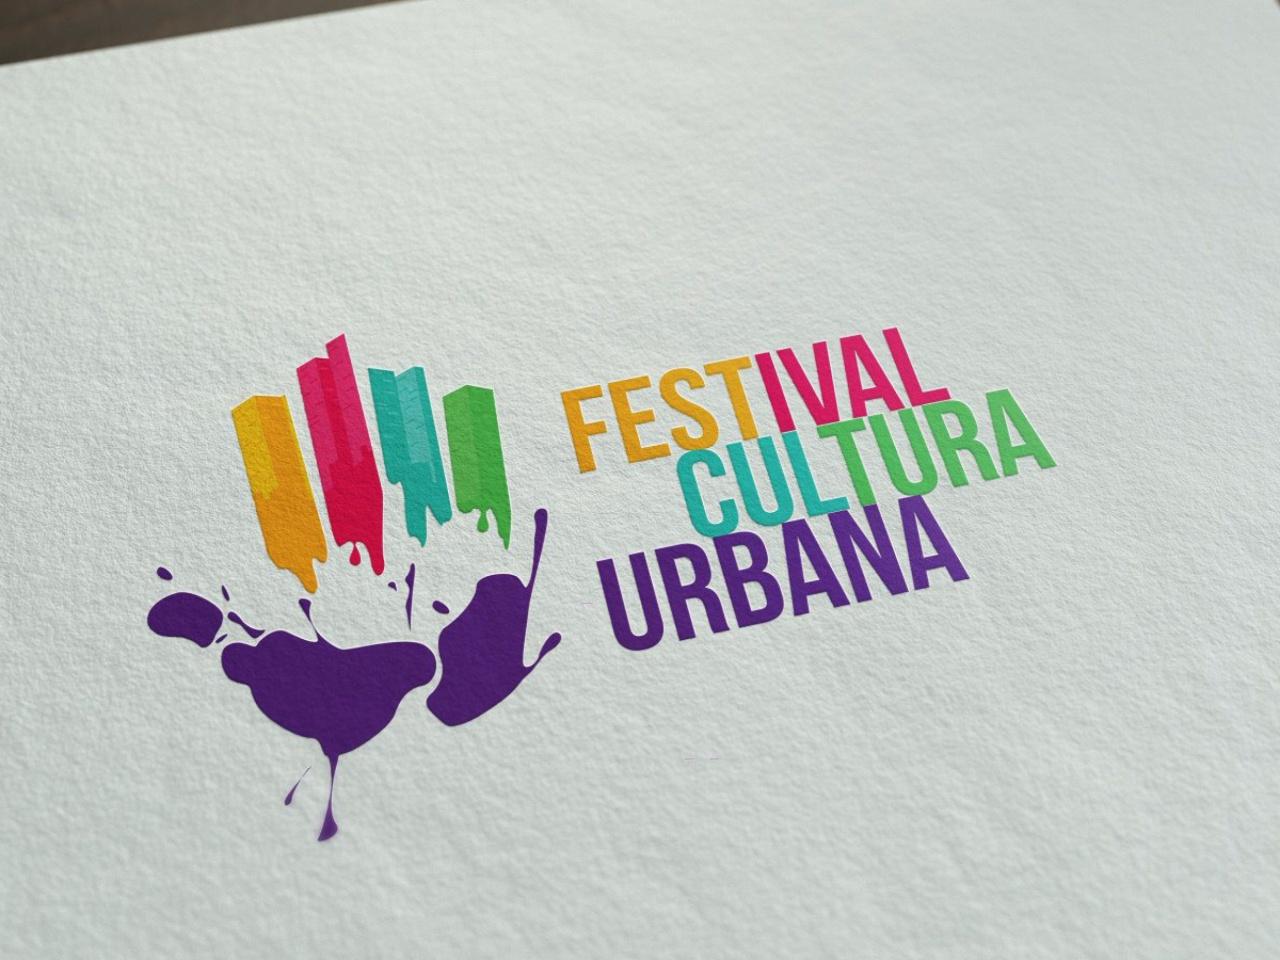 Festival Cultura Urbana